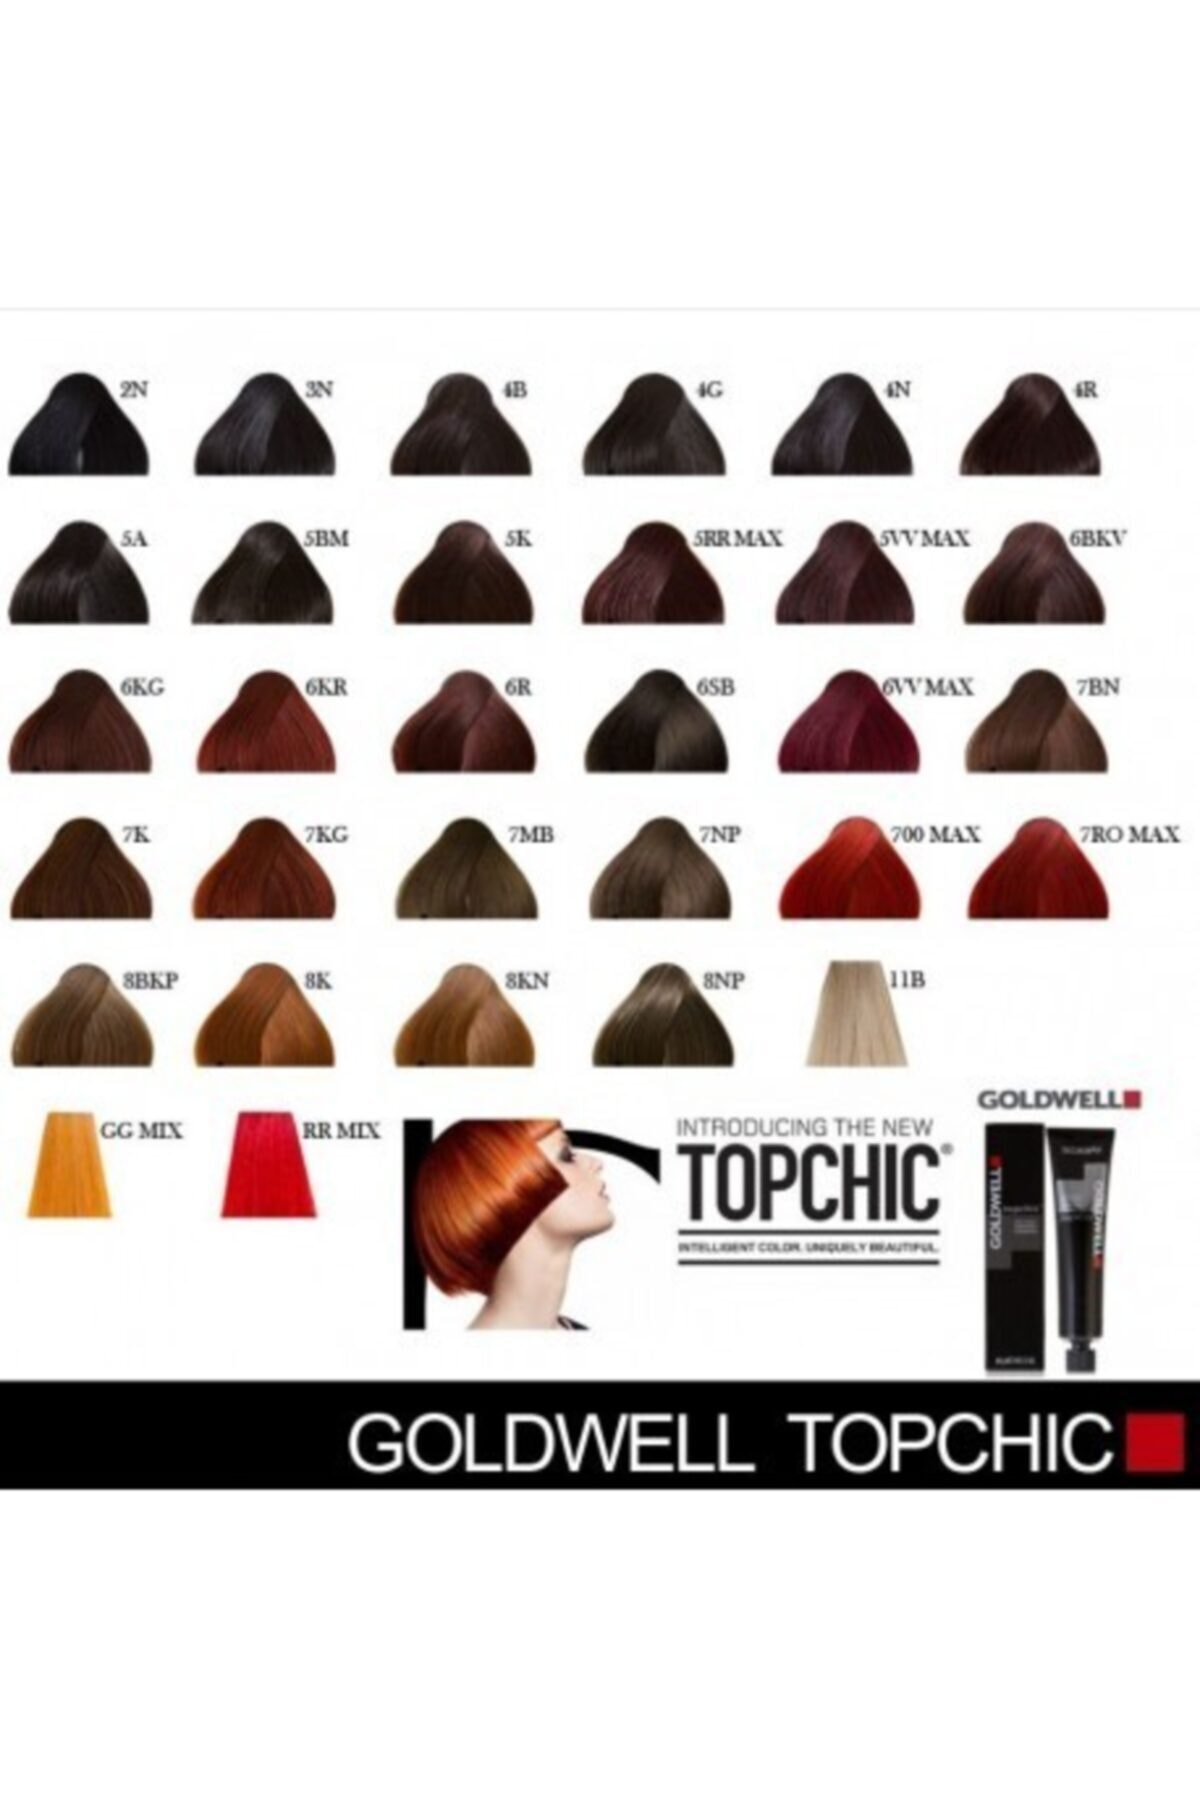 GOLDWELL Topchich Kalıcı Saç Boyası 60 Ml Tüp 2